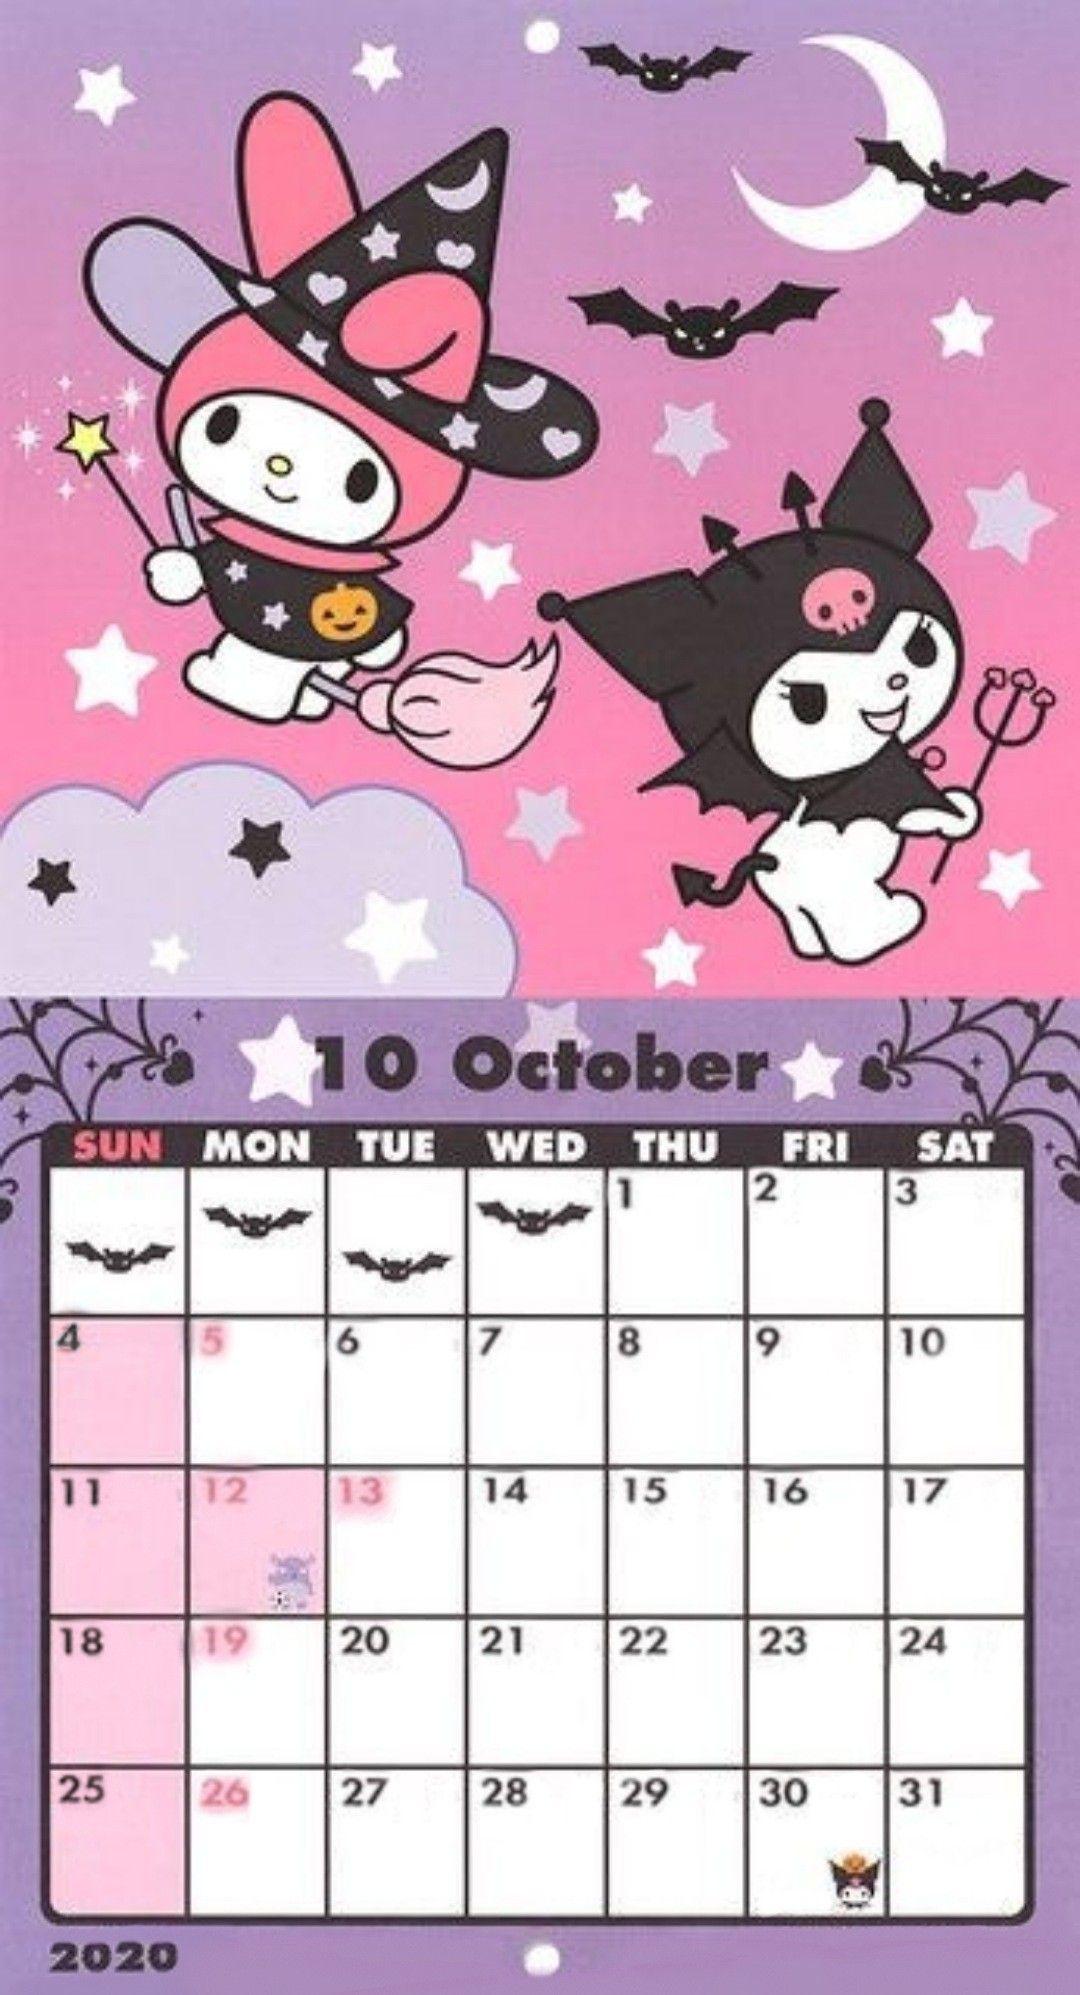 Календарь Хеллоу Китти 2020 In 2020 | Hello Kitty